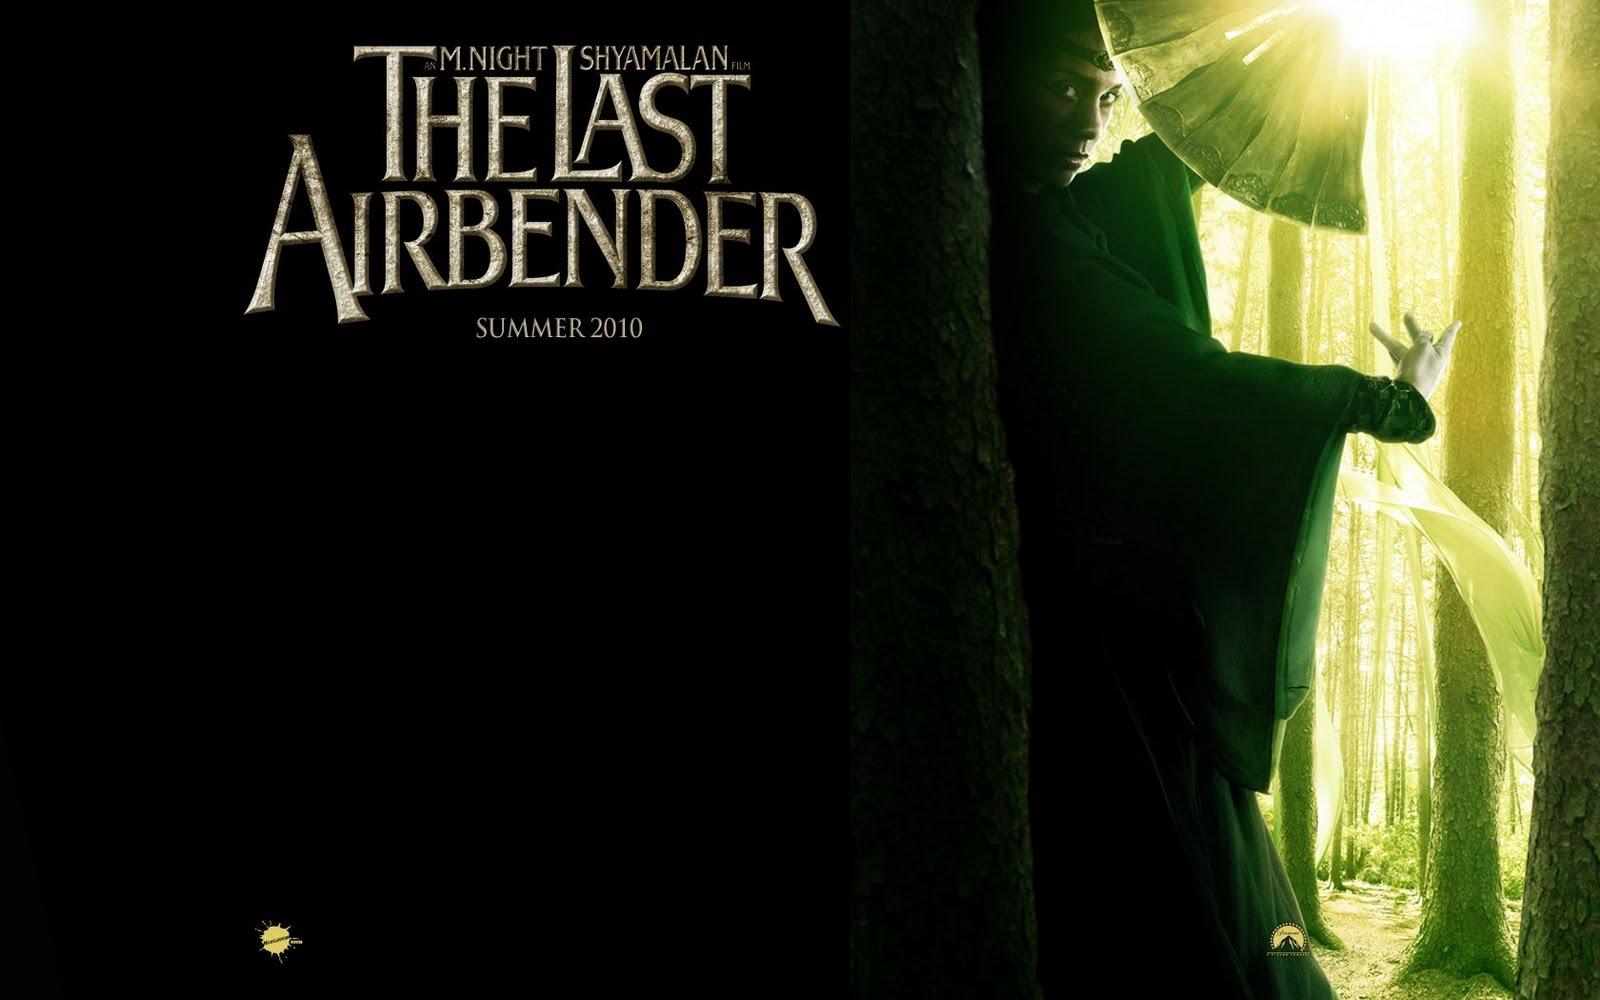 http://1.bp.blogspot.com/_xVDr6U9qpd0/S8ITl1rlk2I/AAAAAAAAA88/RKTHEP-51PY/s1600/Jessica+Andres+in+The+Last+Airbender.jpg